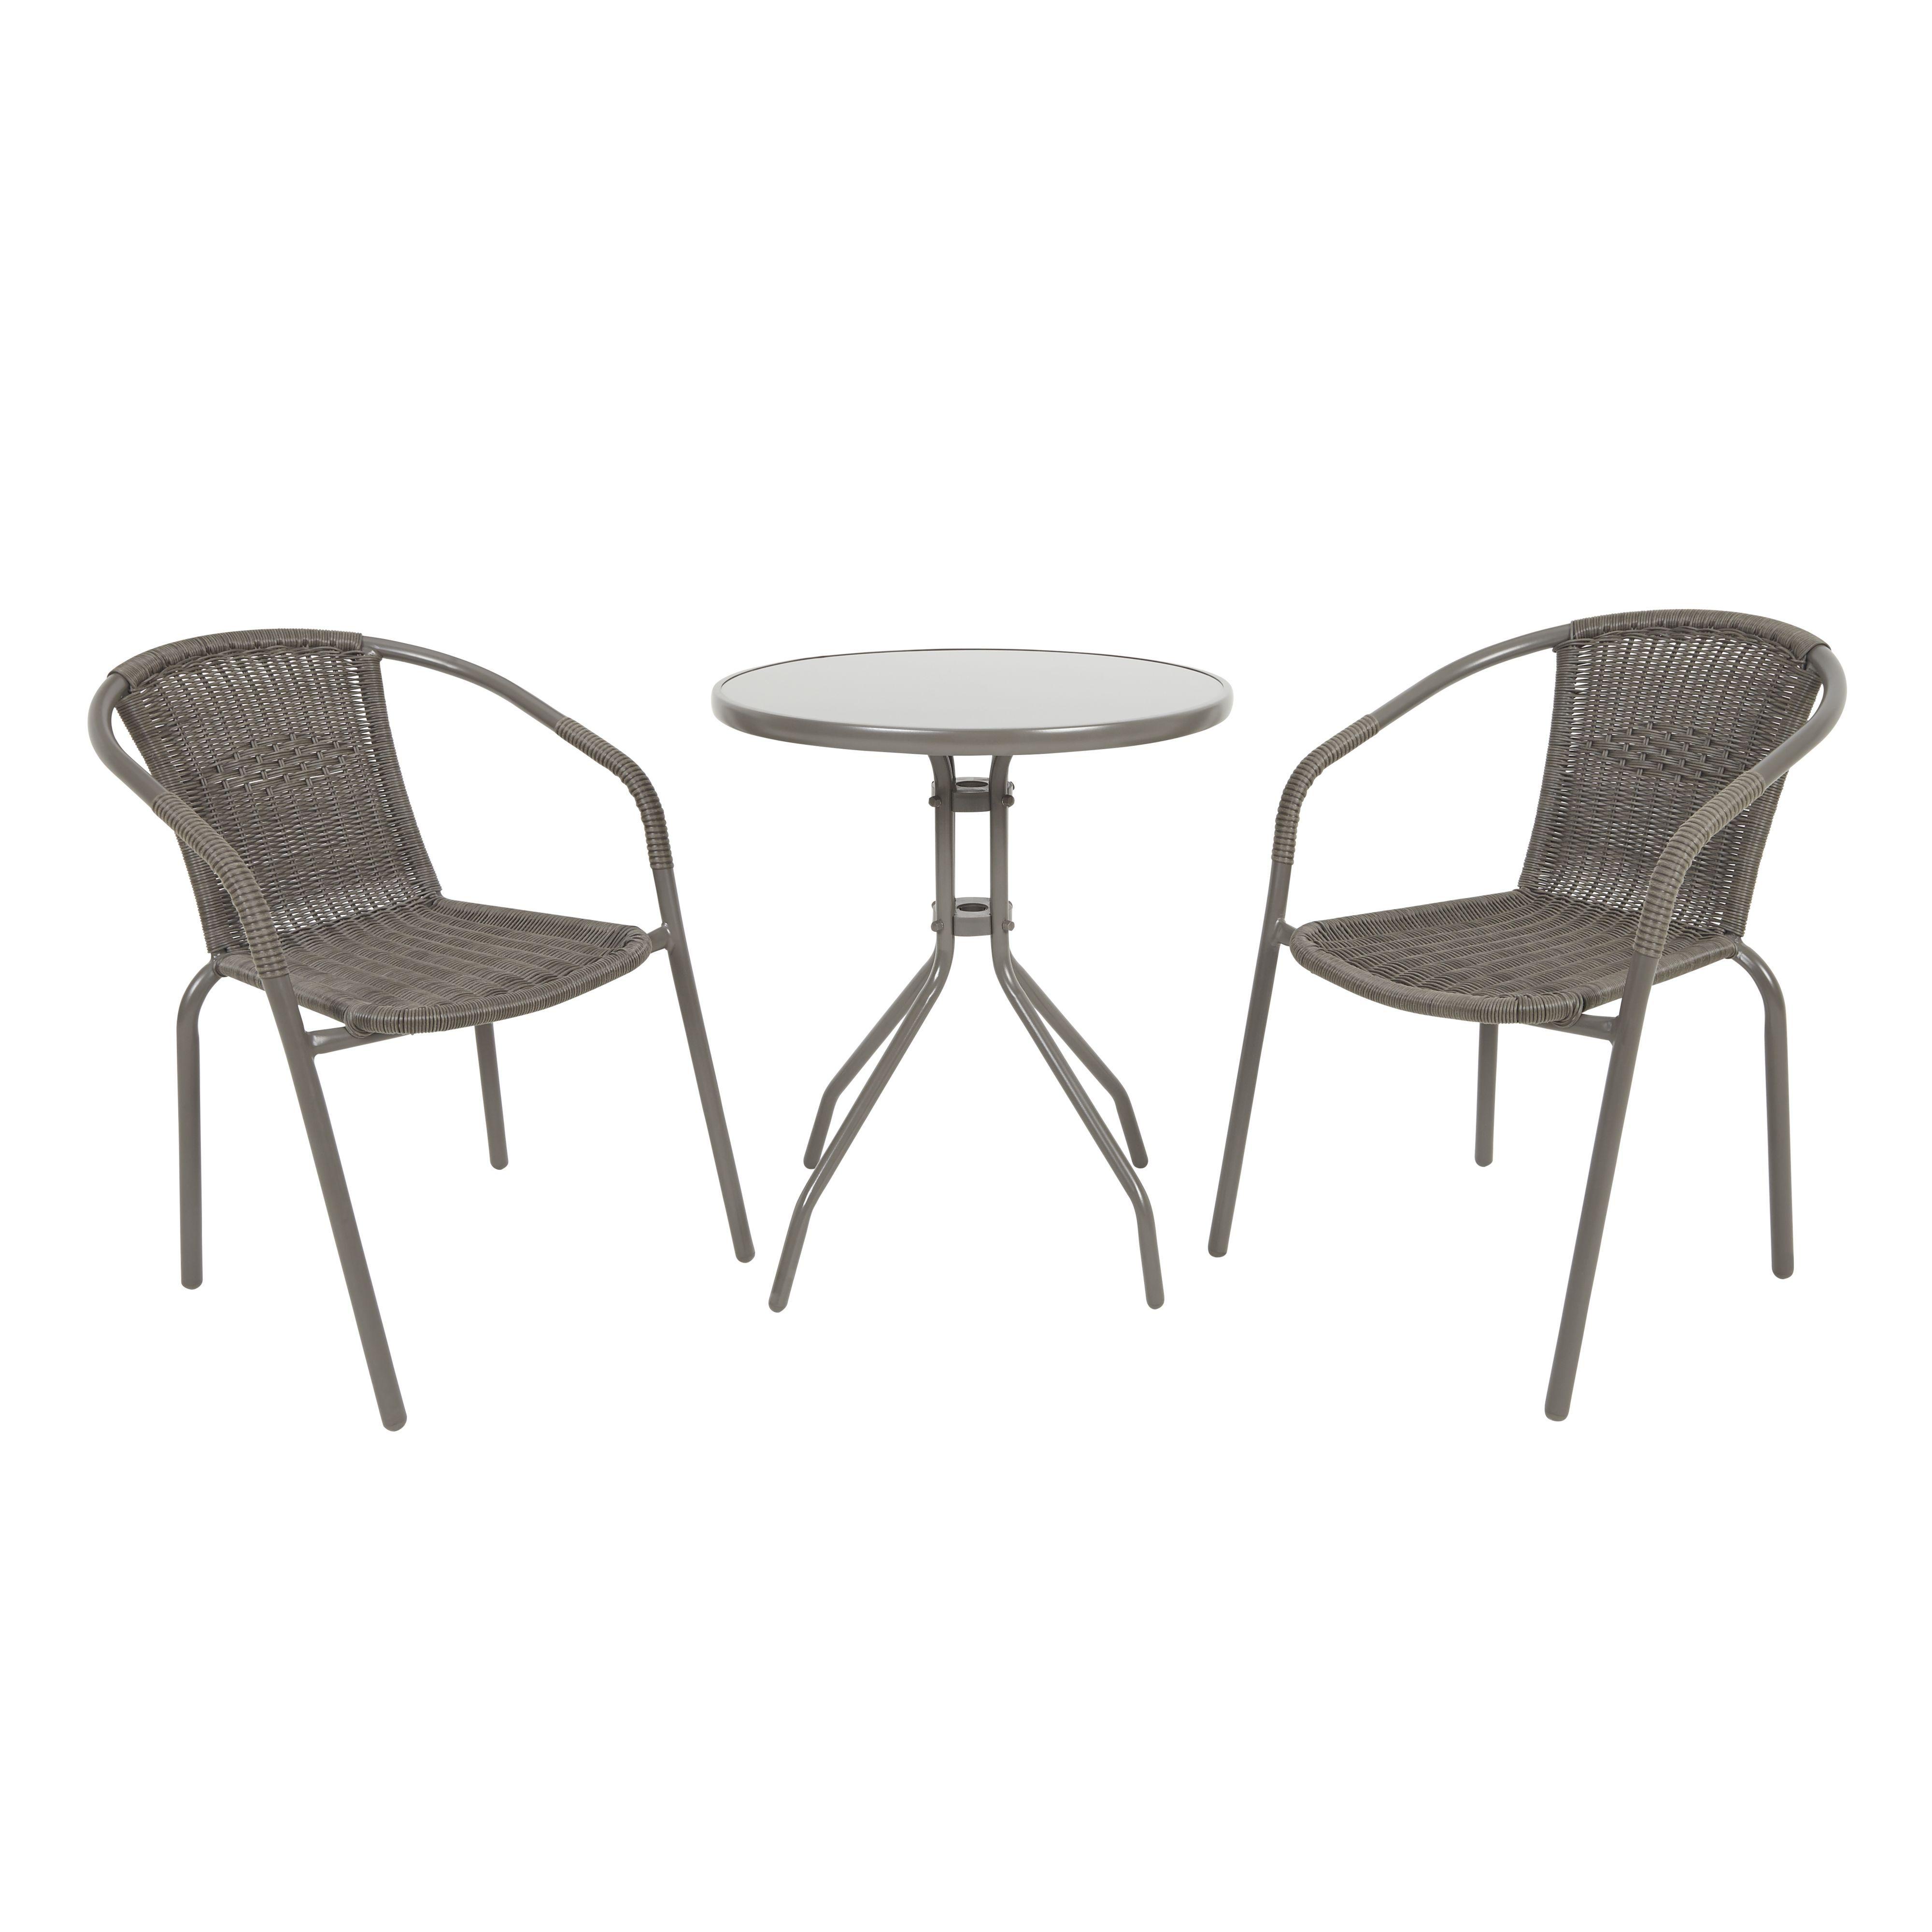 Stupendous Bari Metal 2 Seater Bistro Set Departments Diy At Bq Creativecarmelina Interior Chair Design Creativecarmelinacom